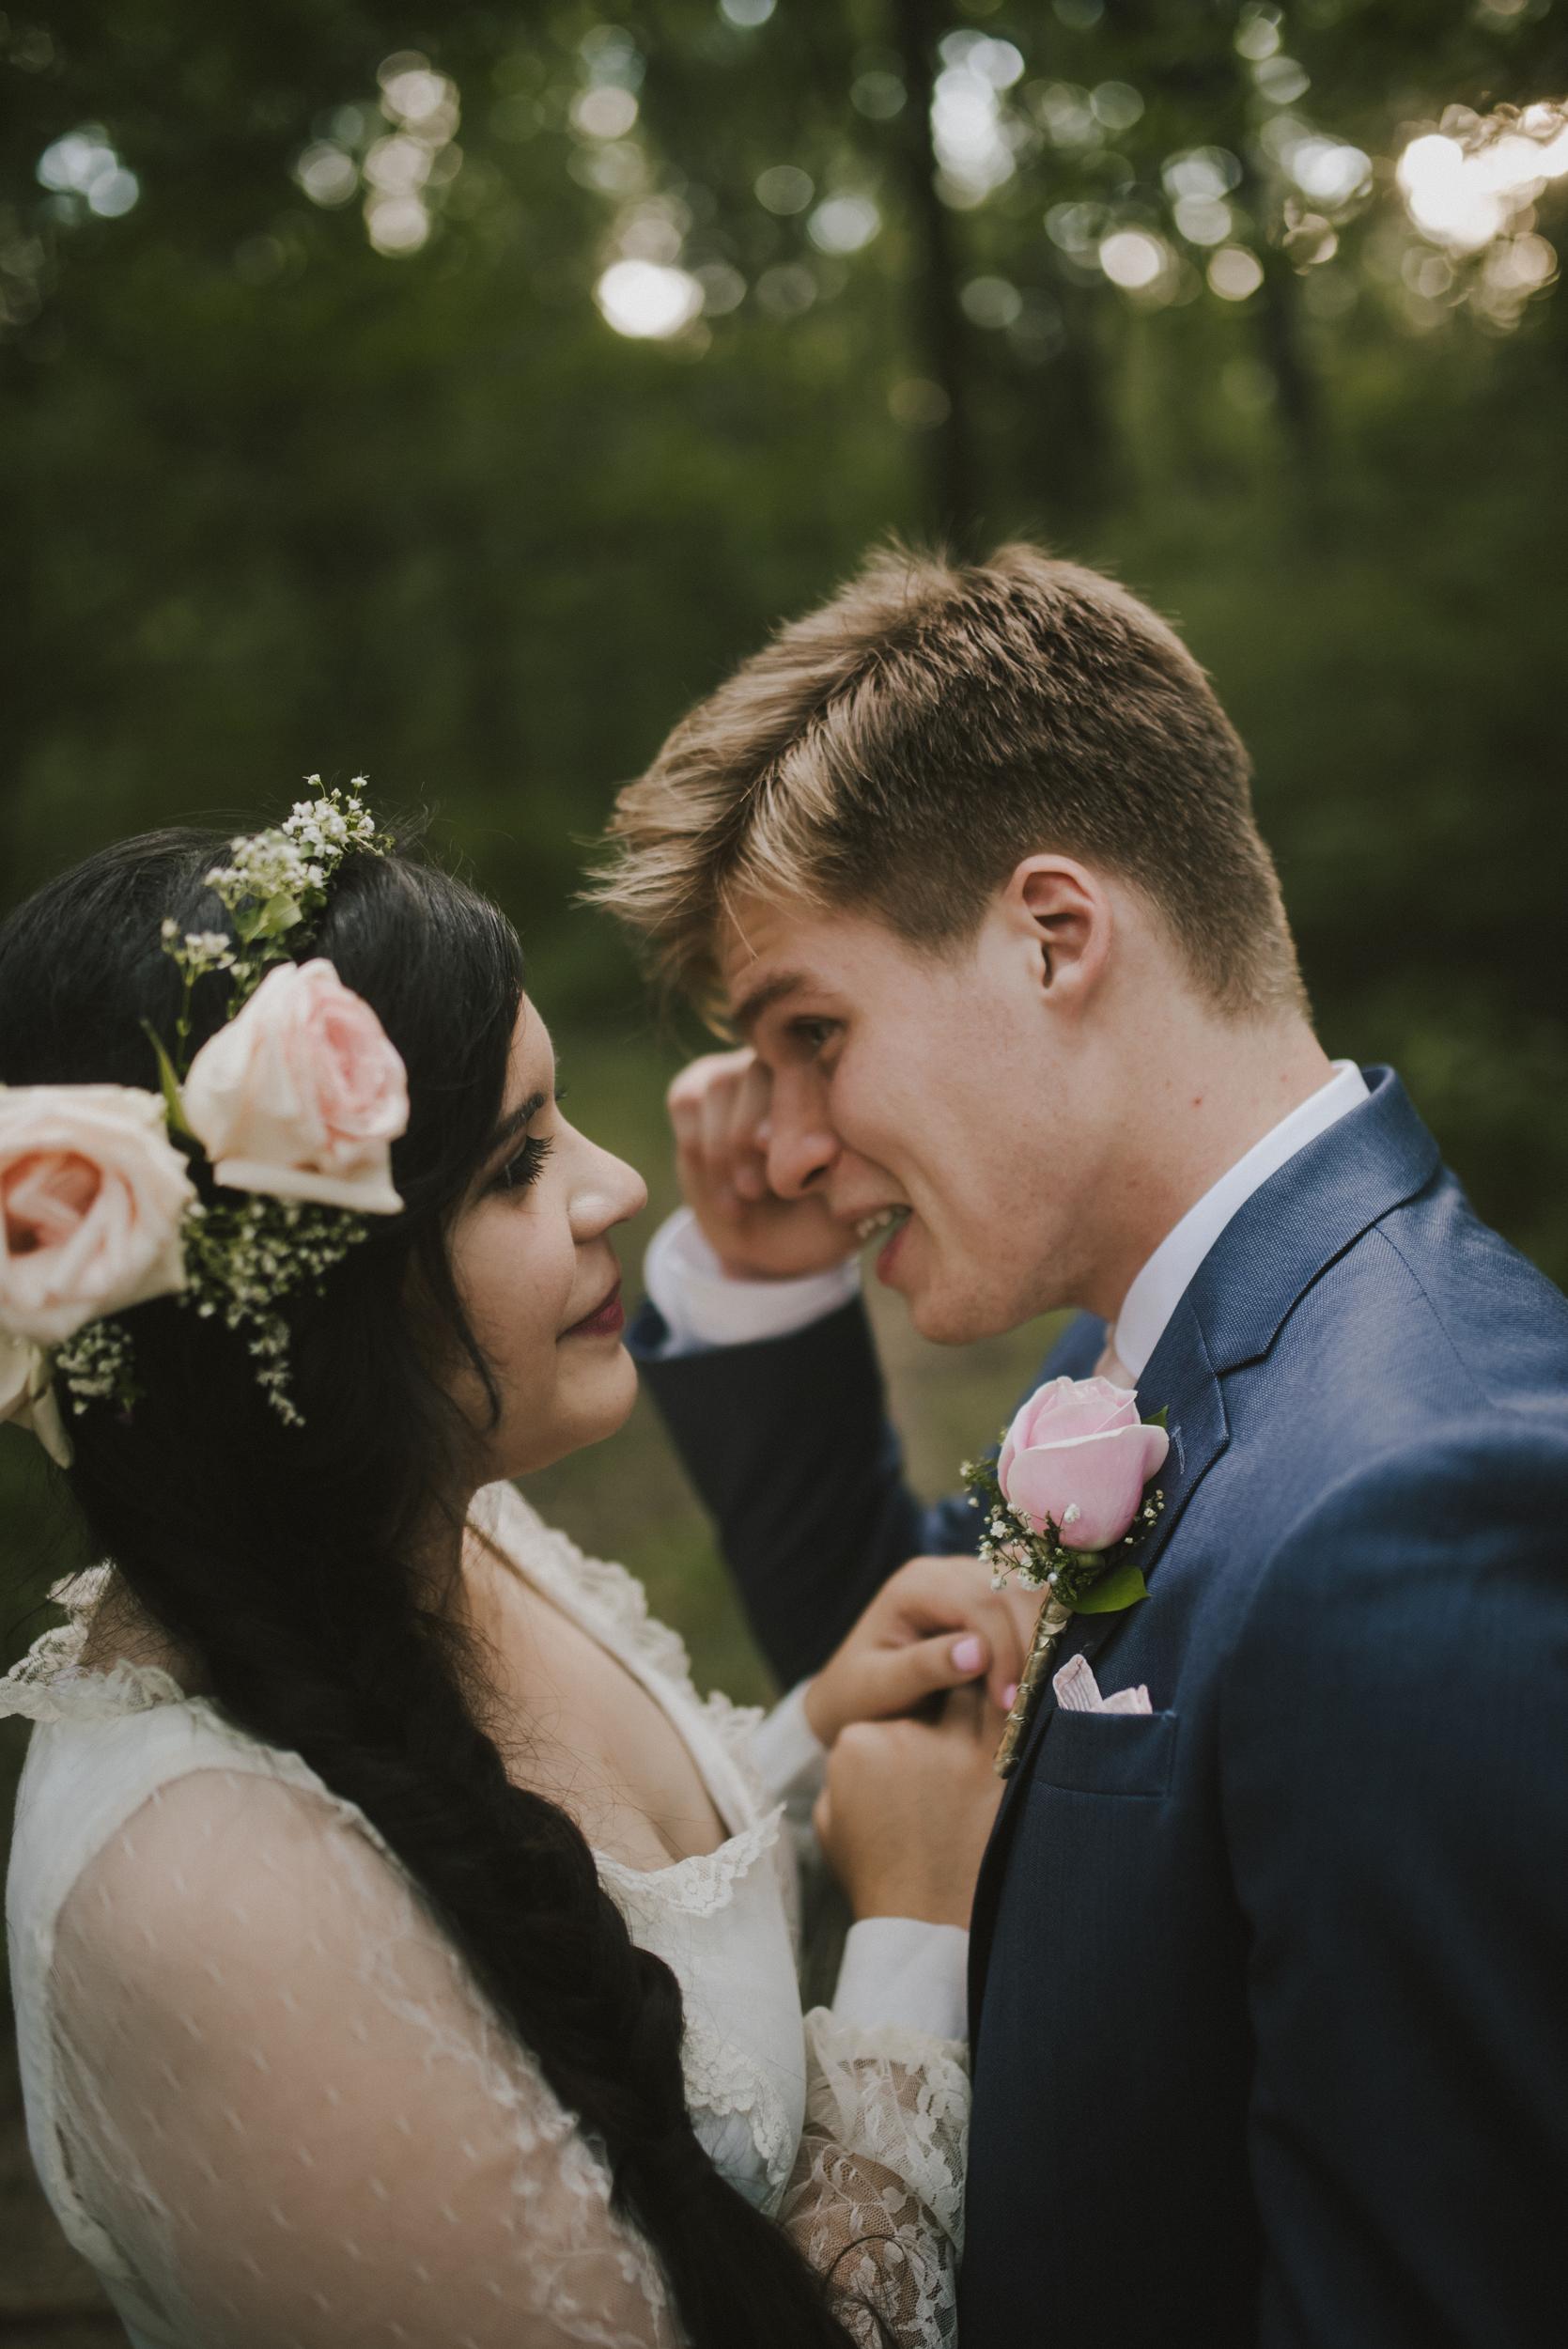 ofRen_weddingphotographer-151.jpg